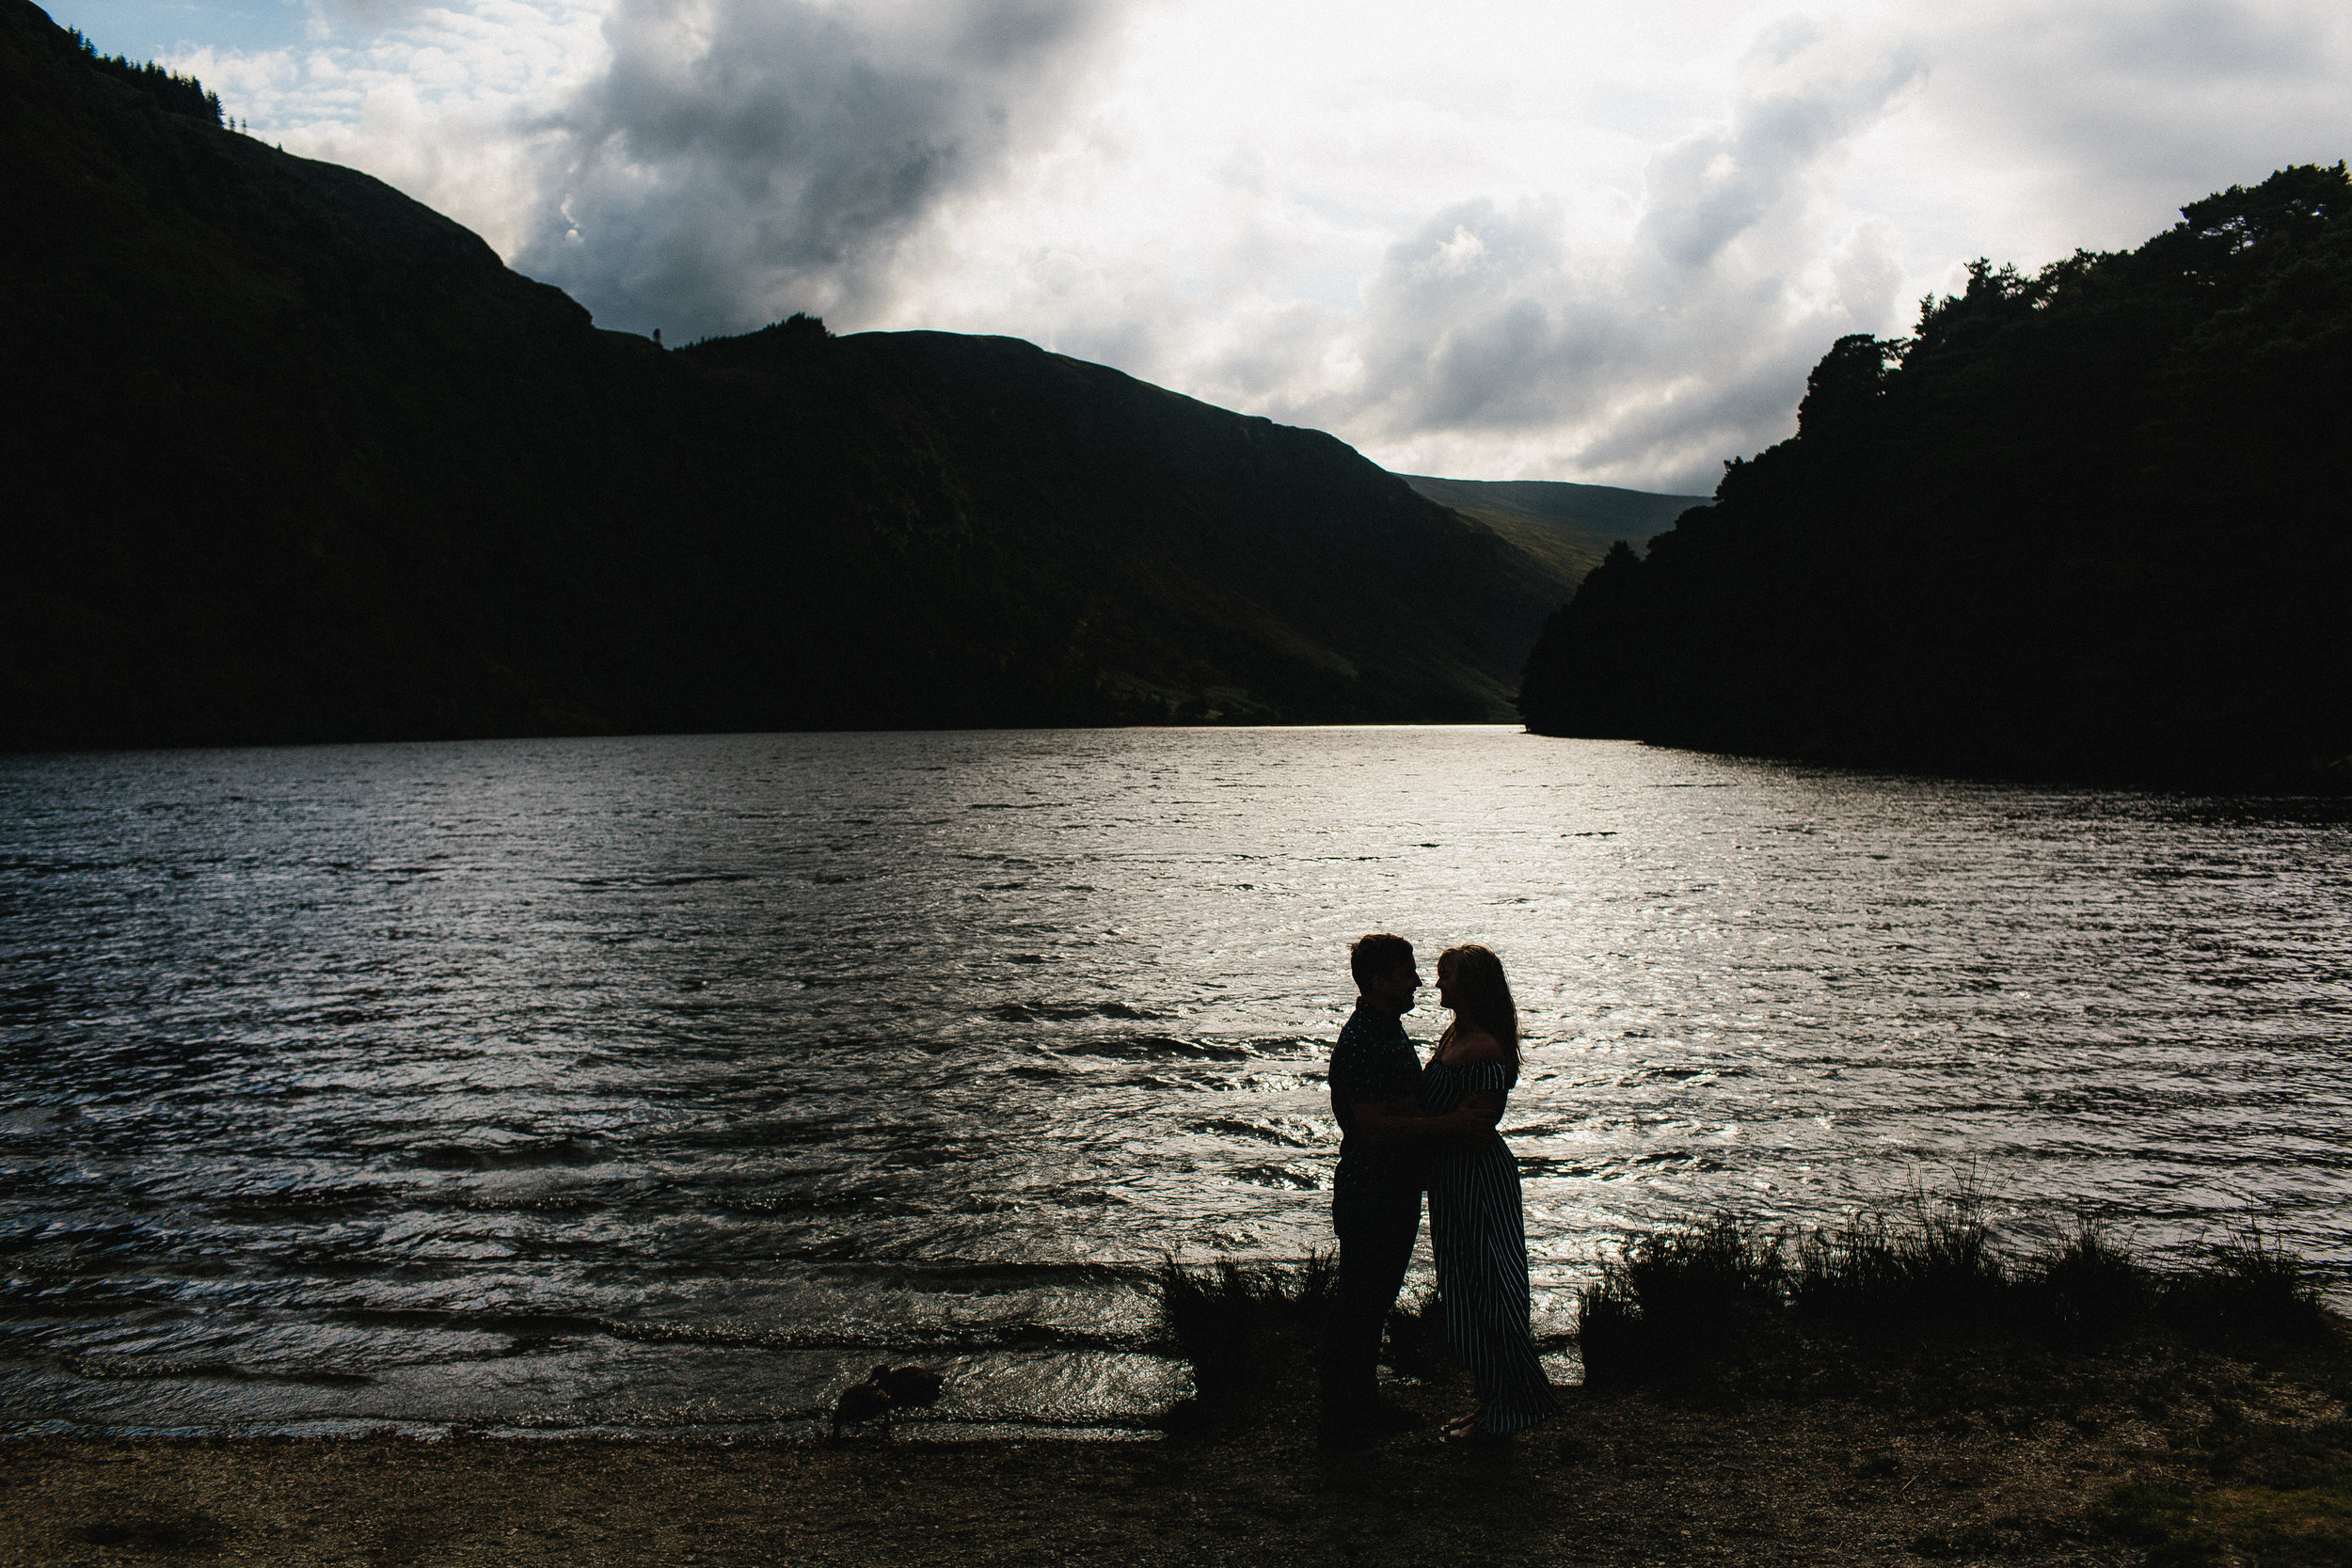 ireland_county_wicklow_glendalough_engagement_adventure_photography_windy_moody_atlanta_wedding_photographer_1267.jpg